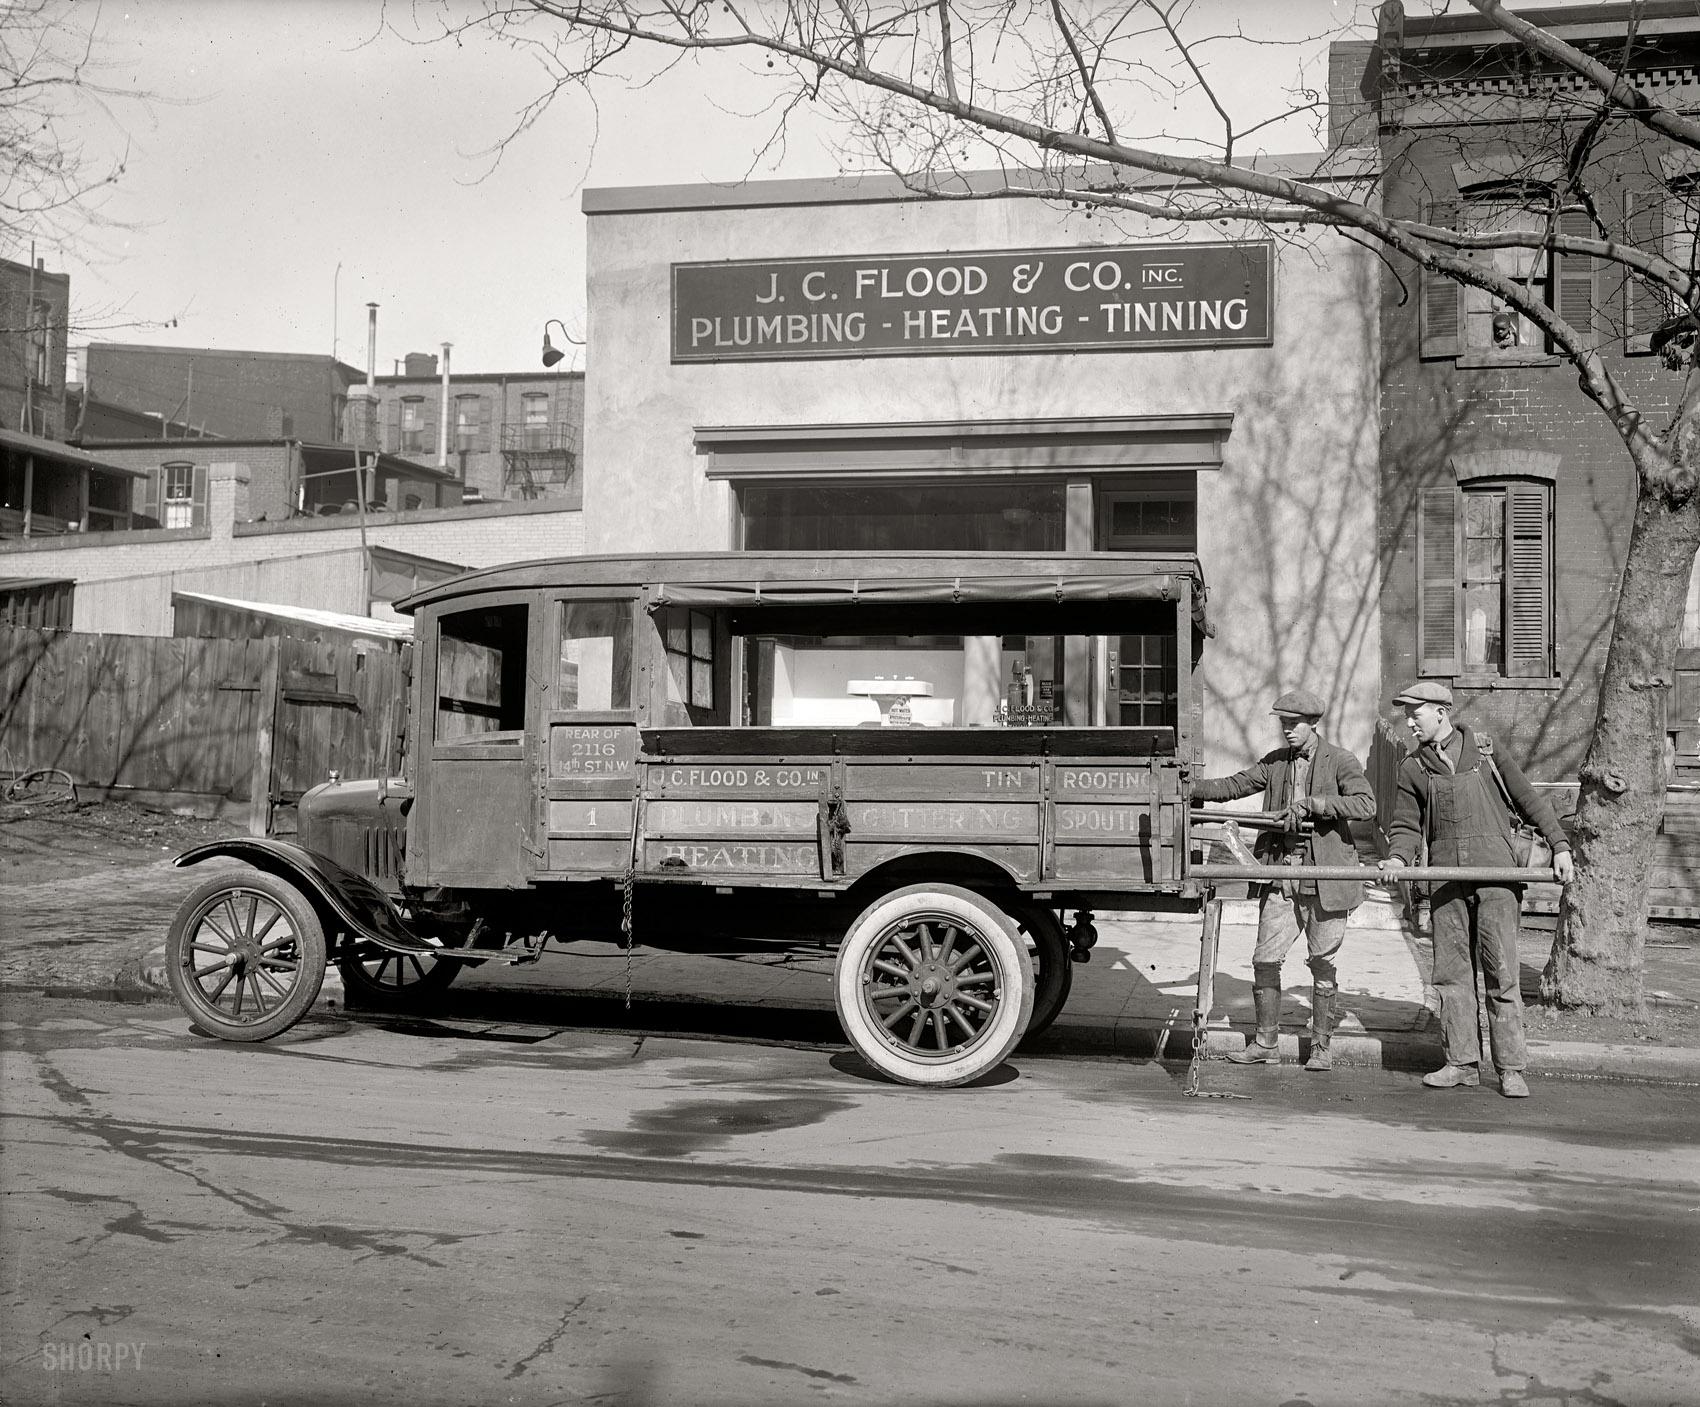 Shorpy Historic Picture Archive J C Flood 1926 High